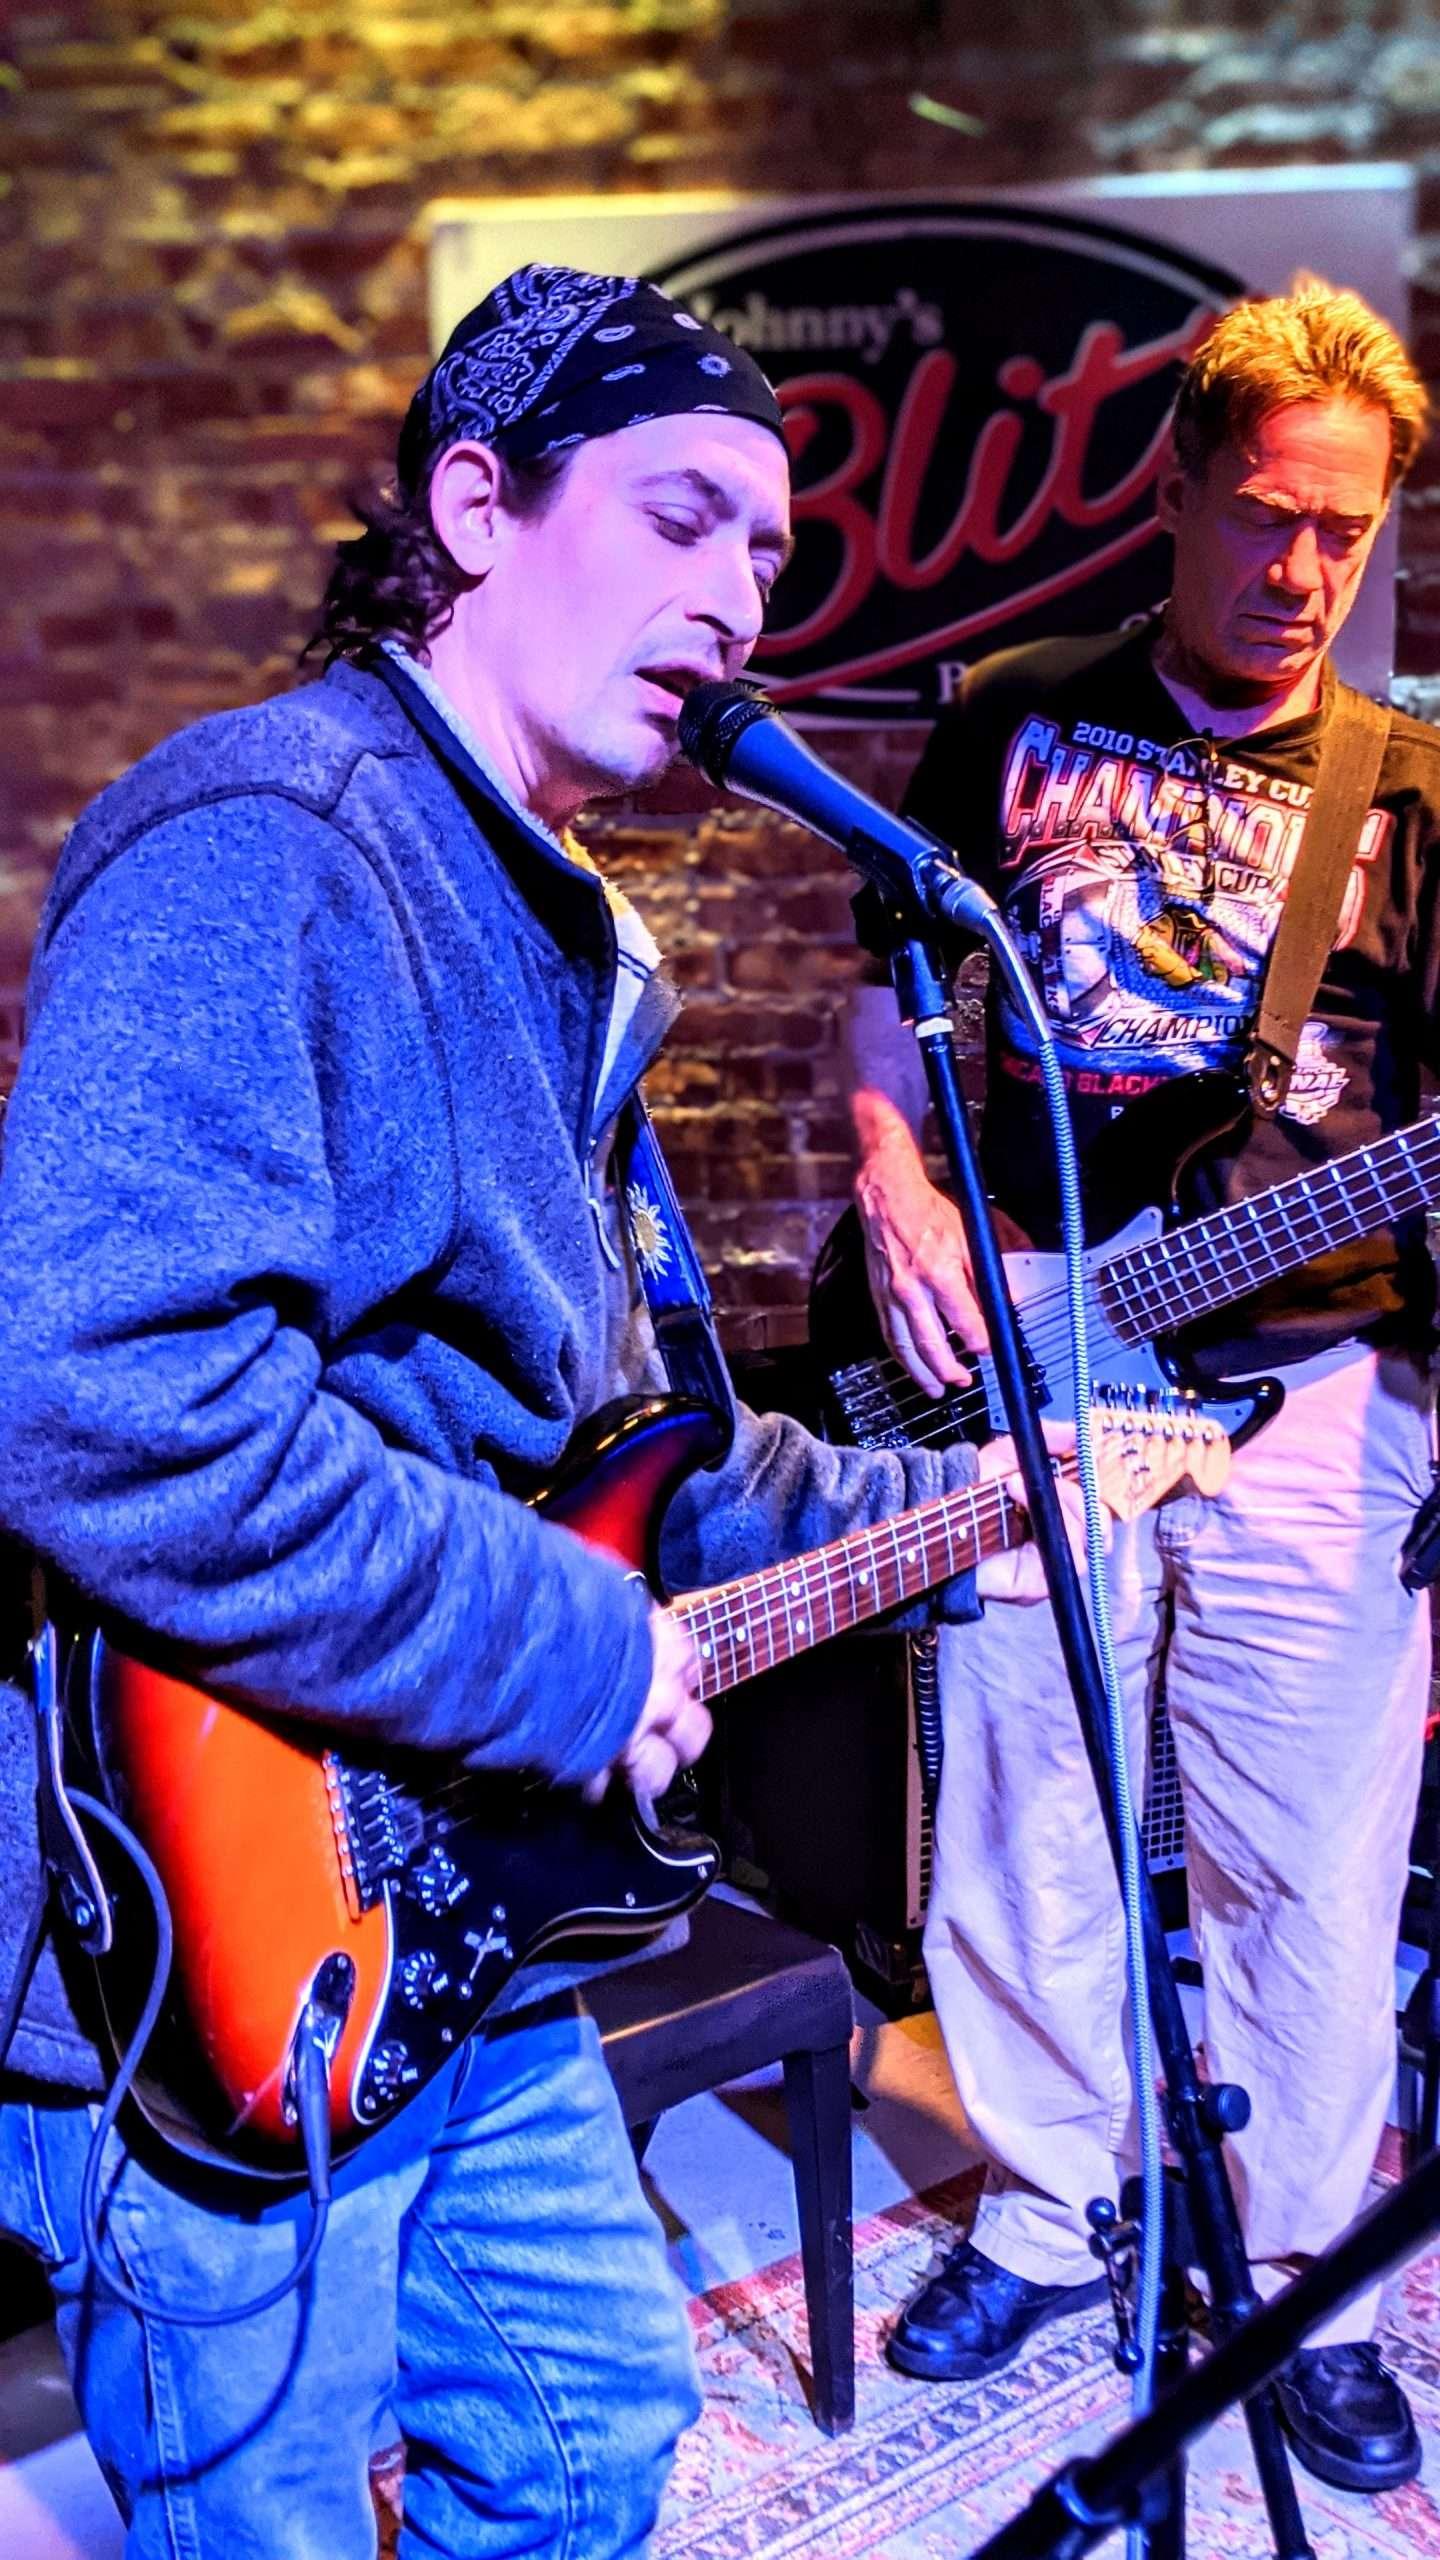 Brian's Open Mic Experiences At Johnny's Blitz Bar & Grill 45